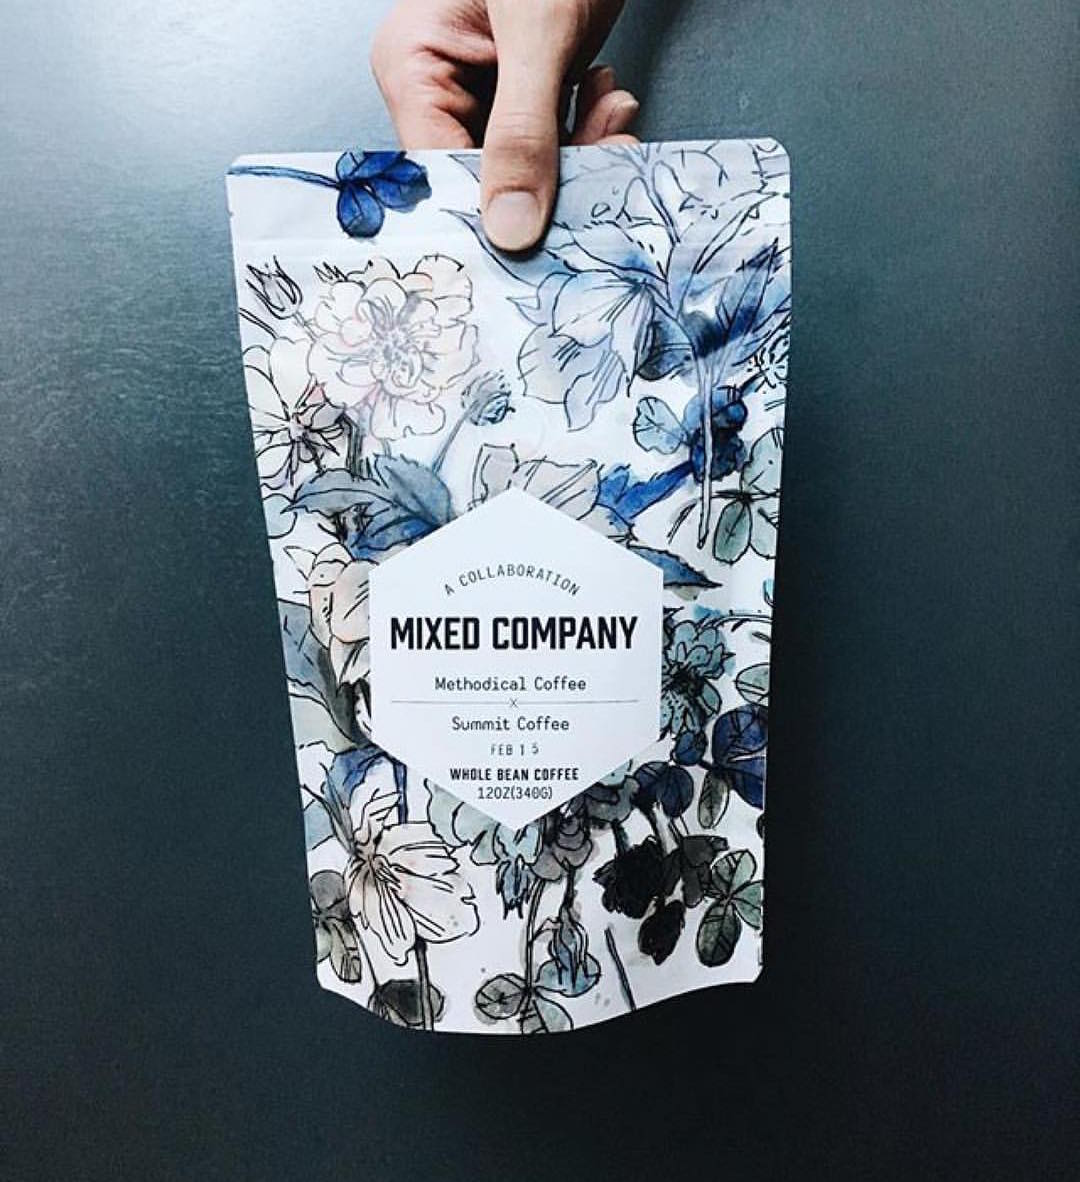 mixed company coffee